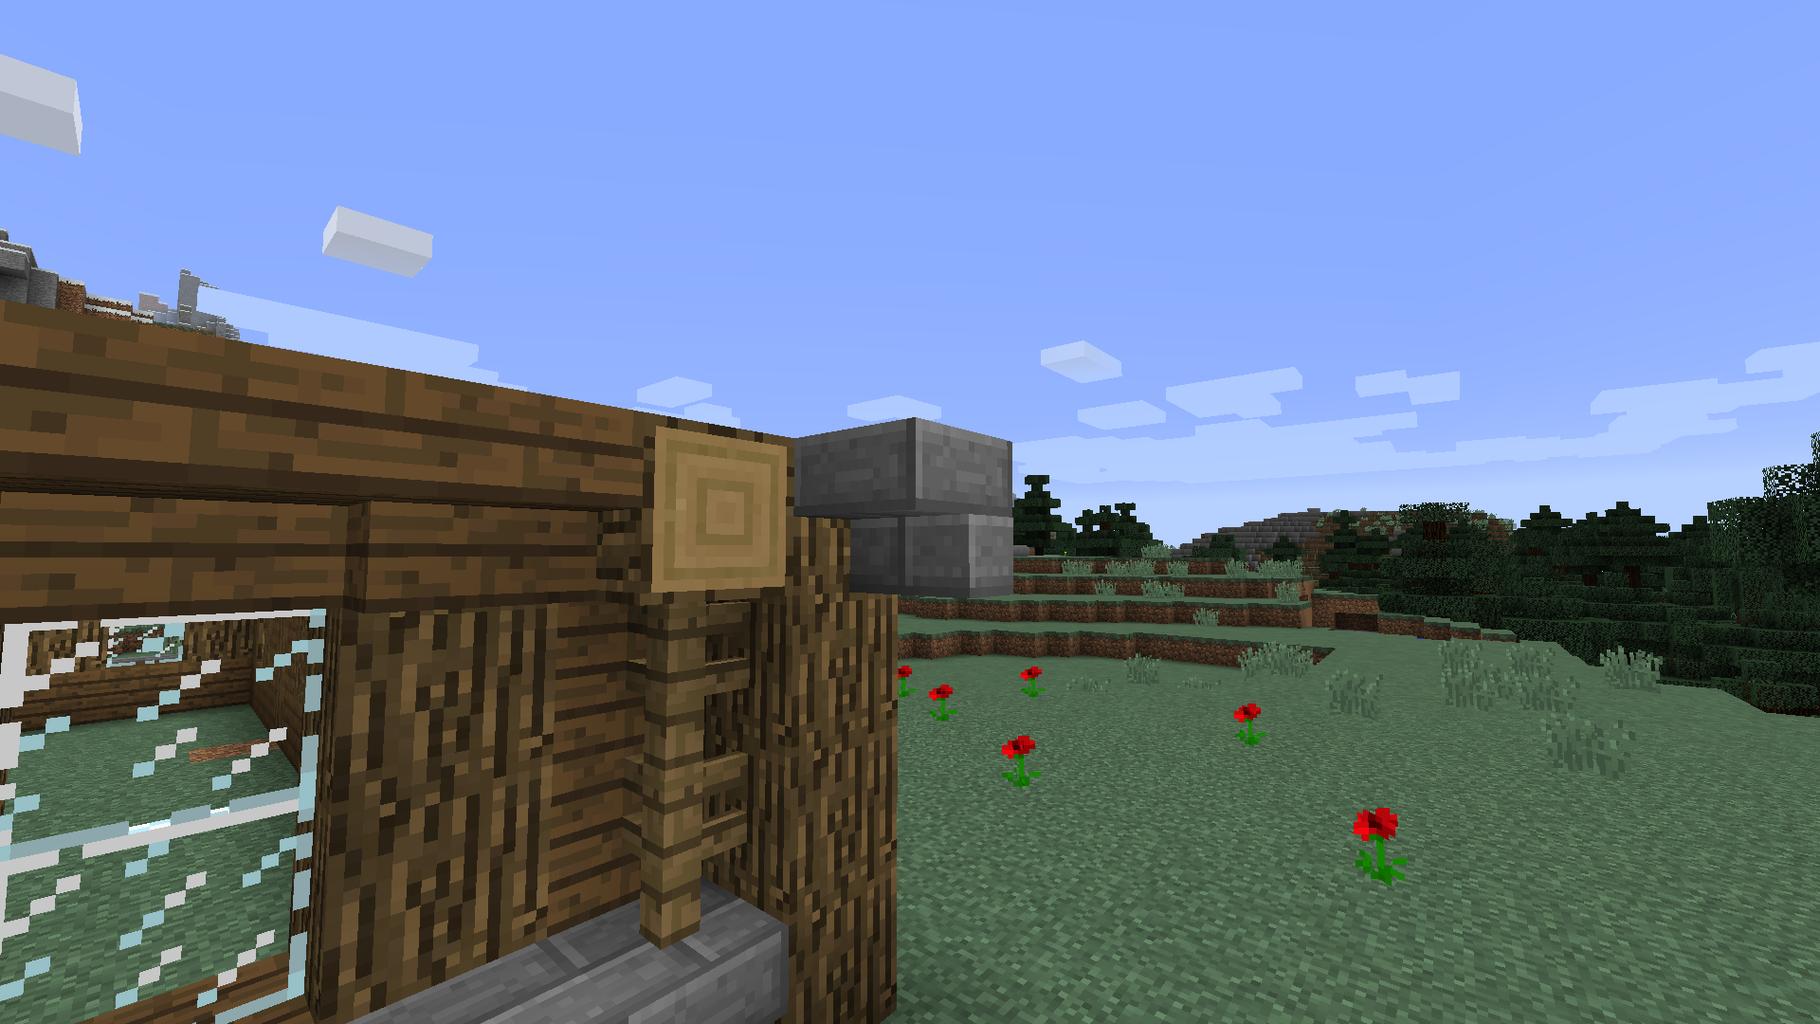 Roofing - Narrow Walls